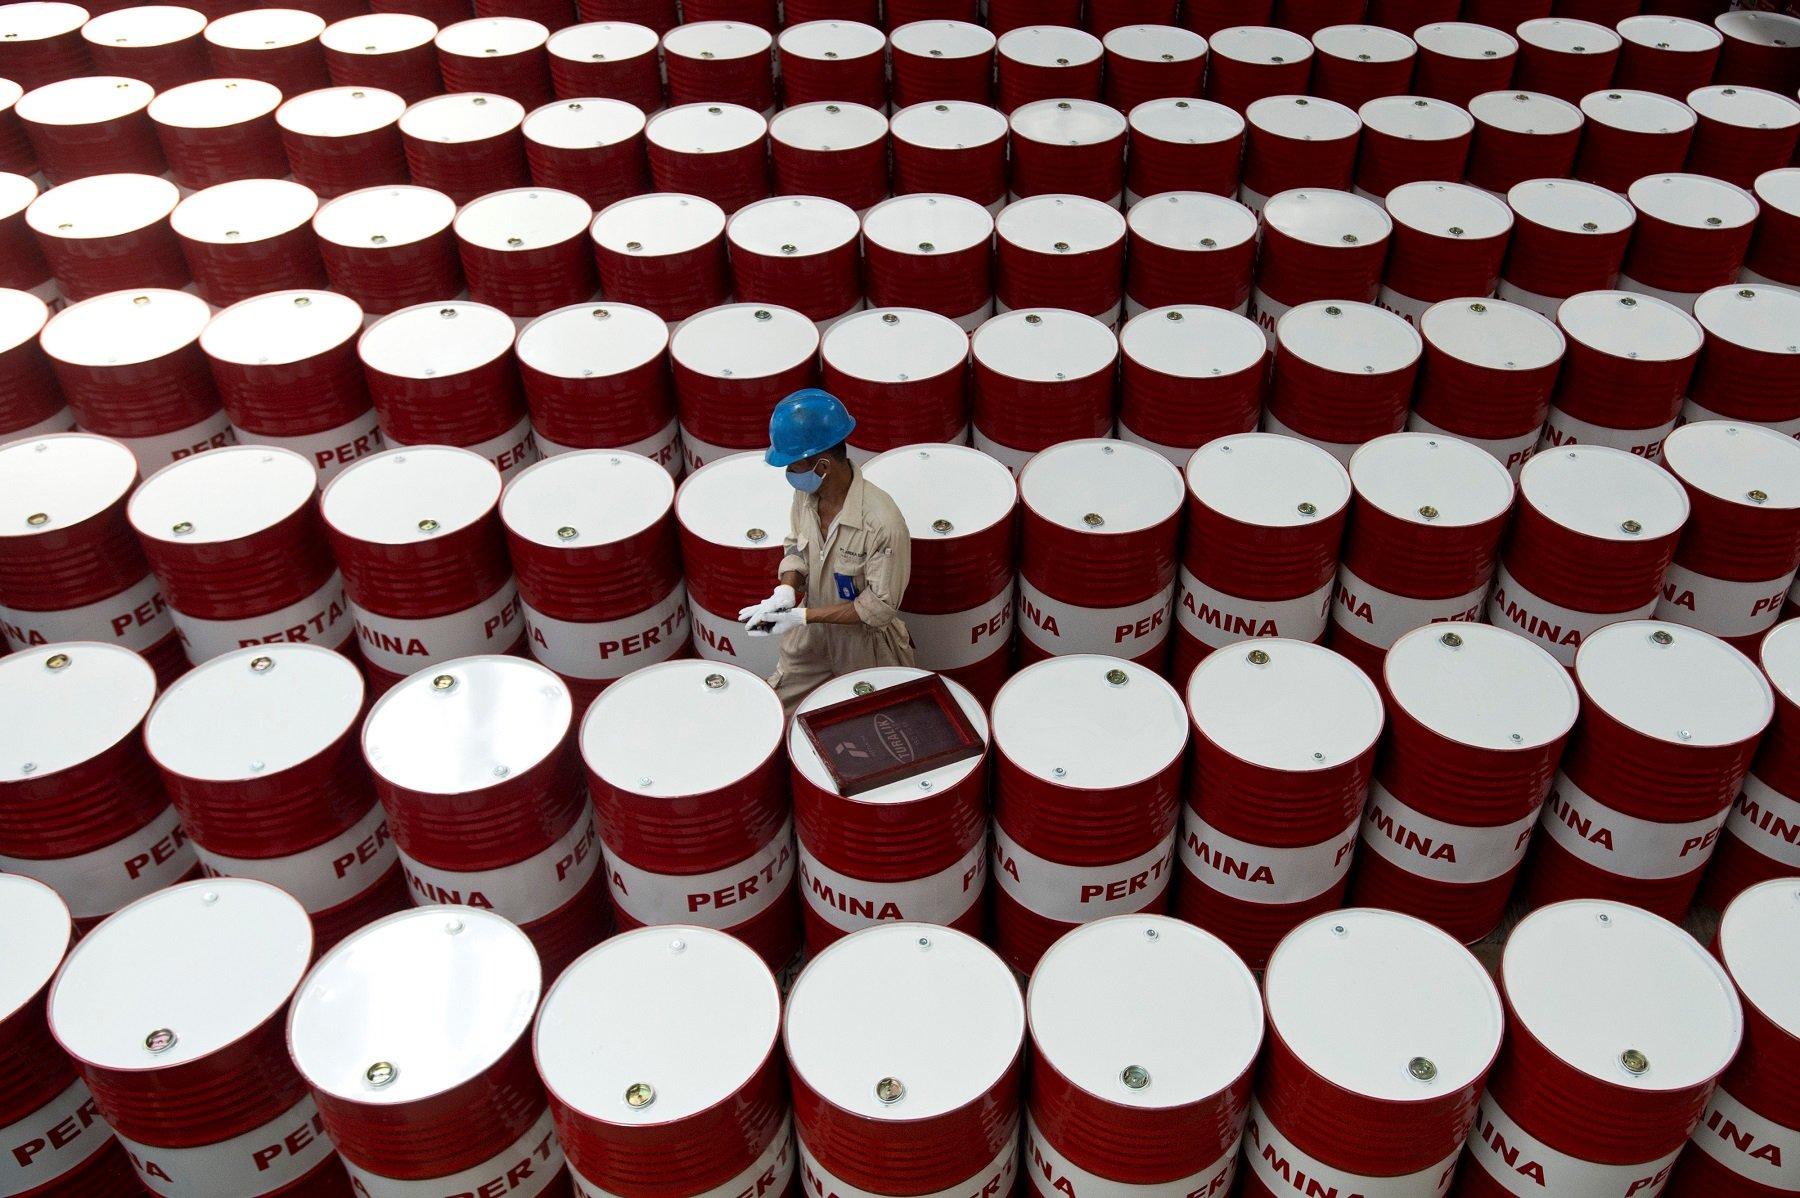 Venezuela Has 300 Billion Barrels of Oil and Is a Poverty Train Wreck